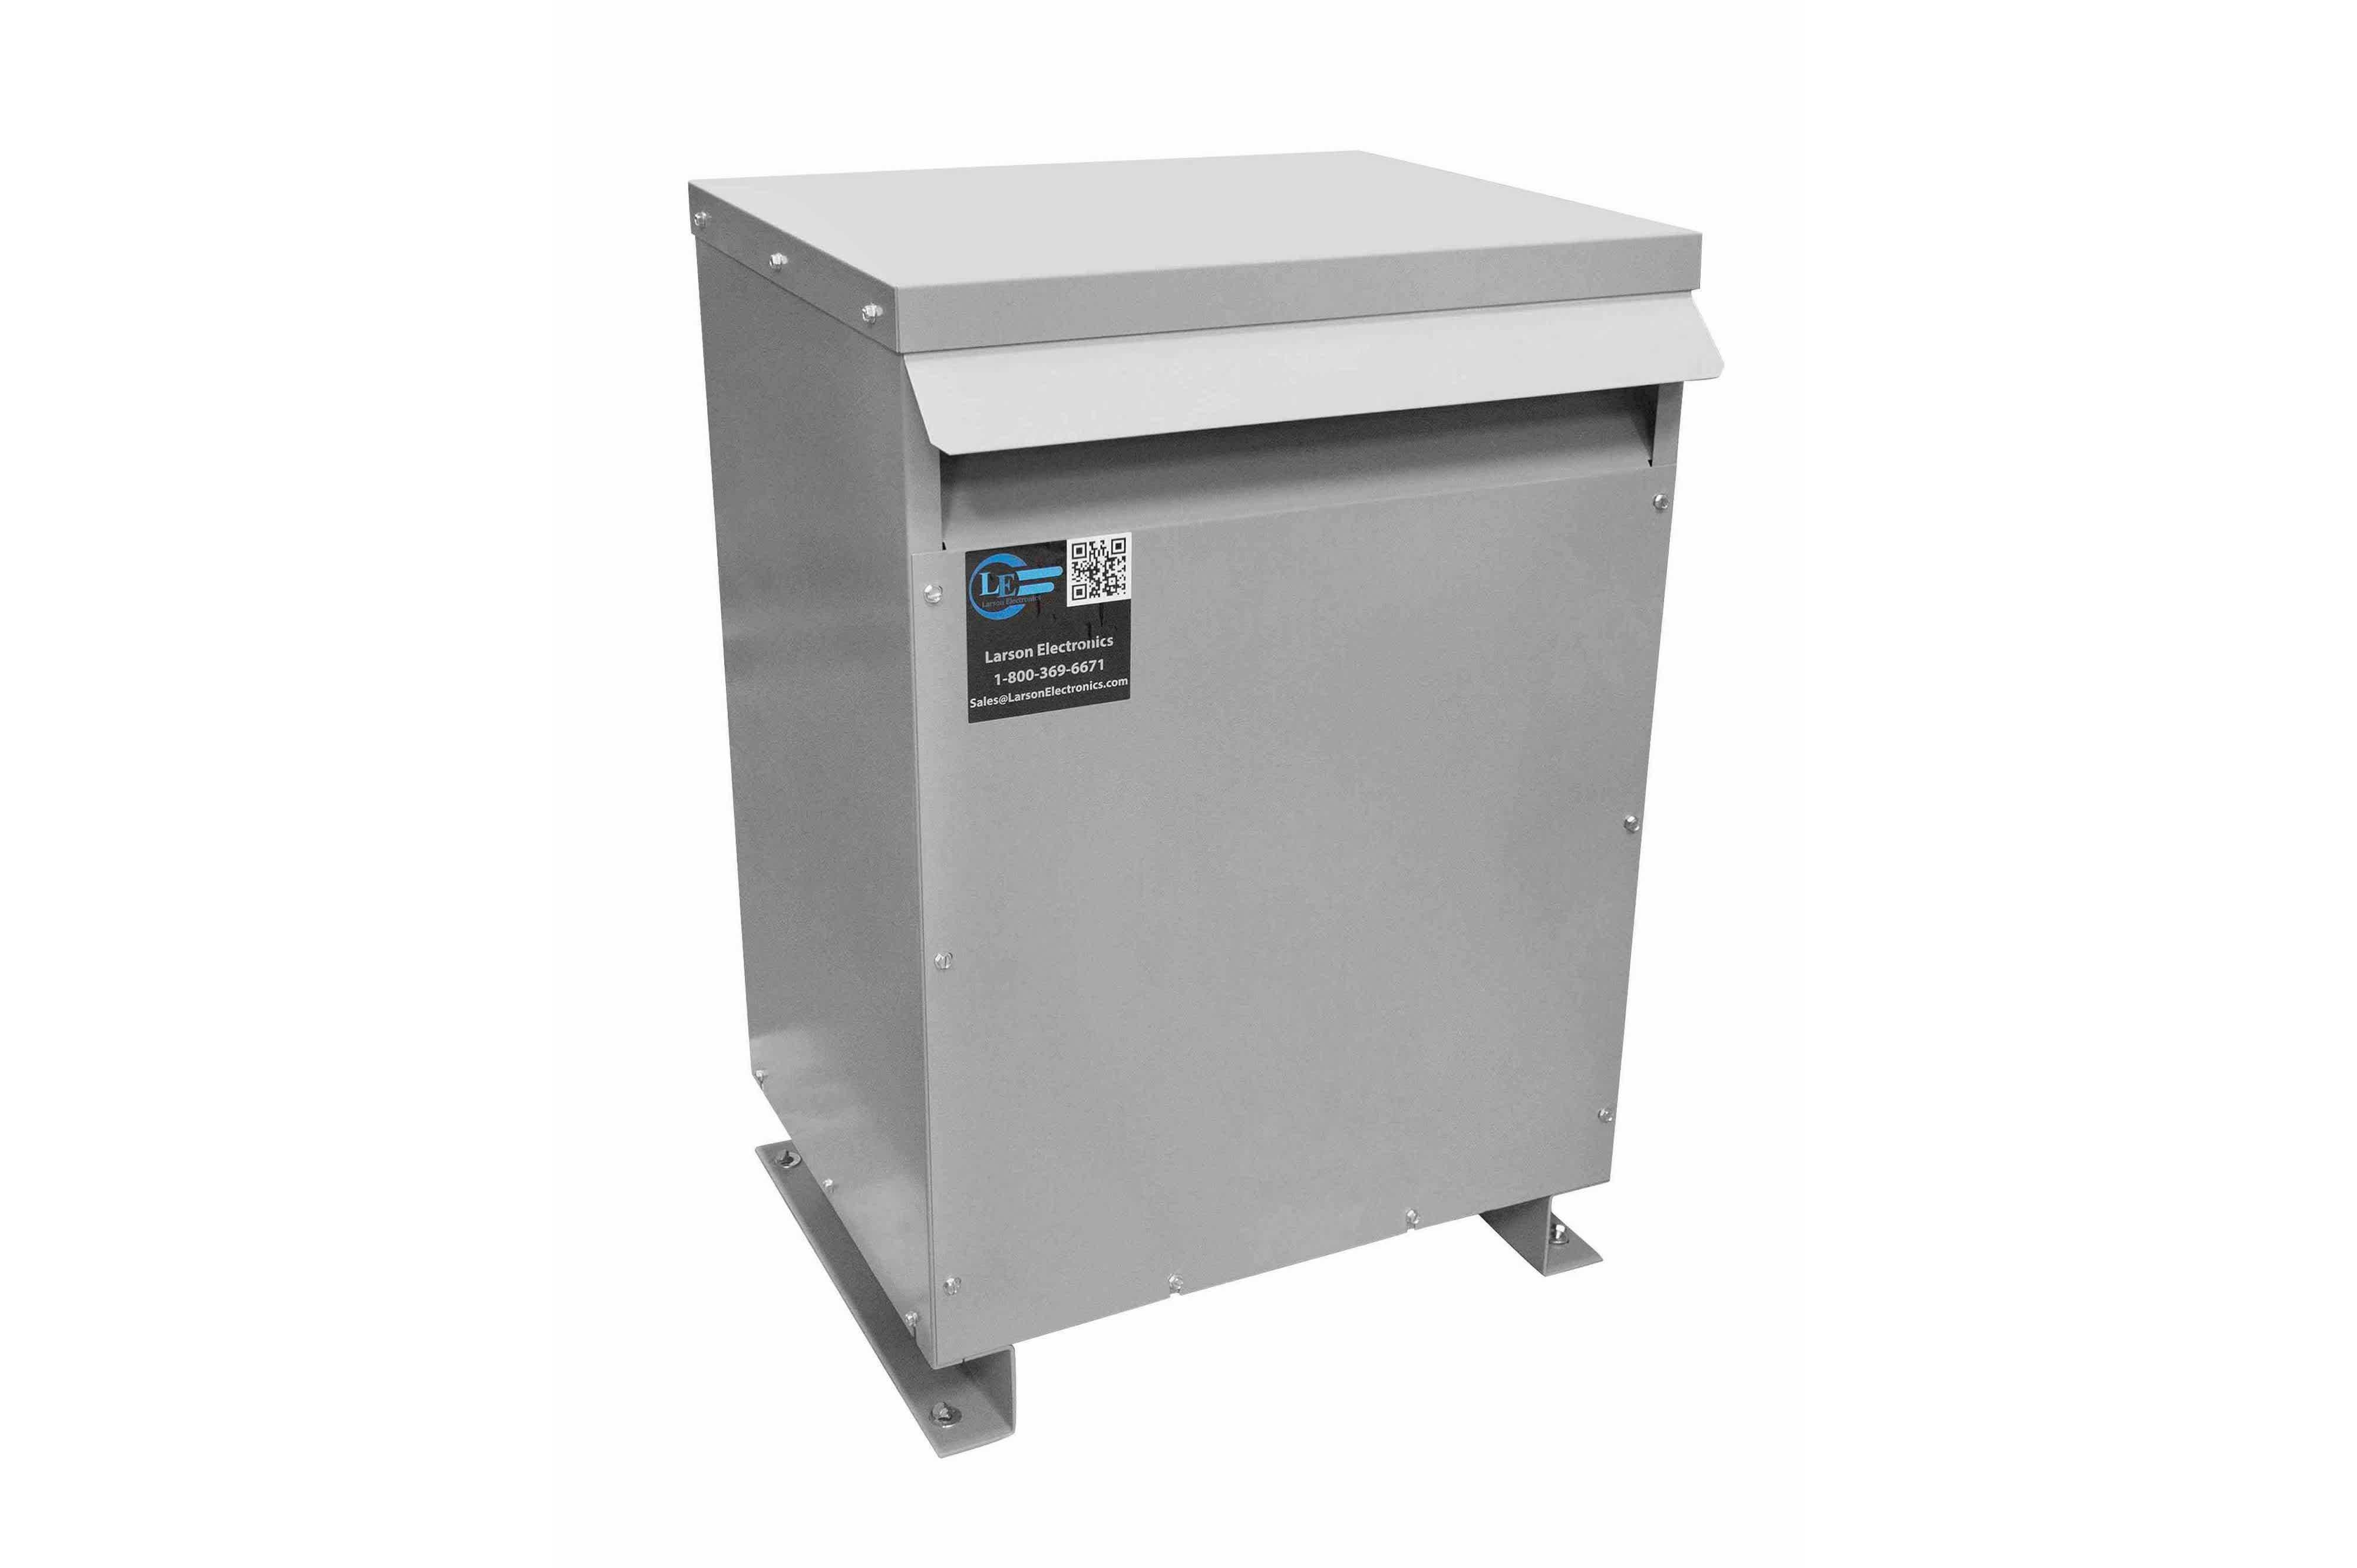 125 kVA 3PH Isolation Transformer, 415V Wye Primary, 208Y/120 Wye-N Secondary, N3R, Ventilated, 60 Hz